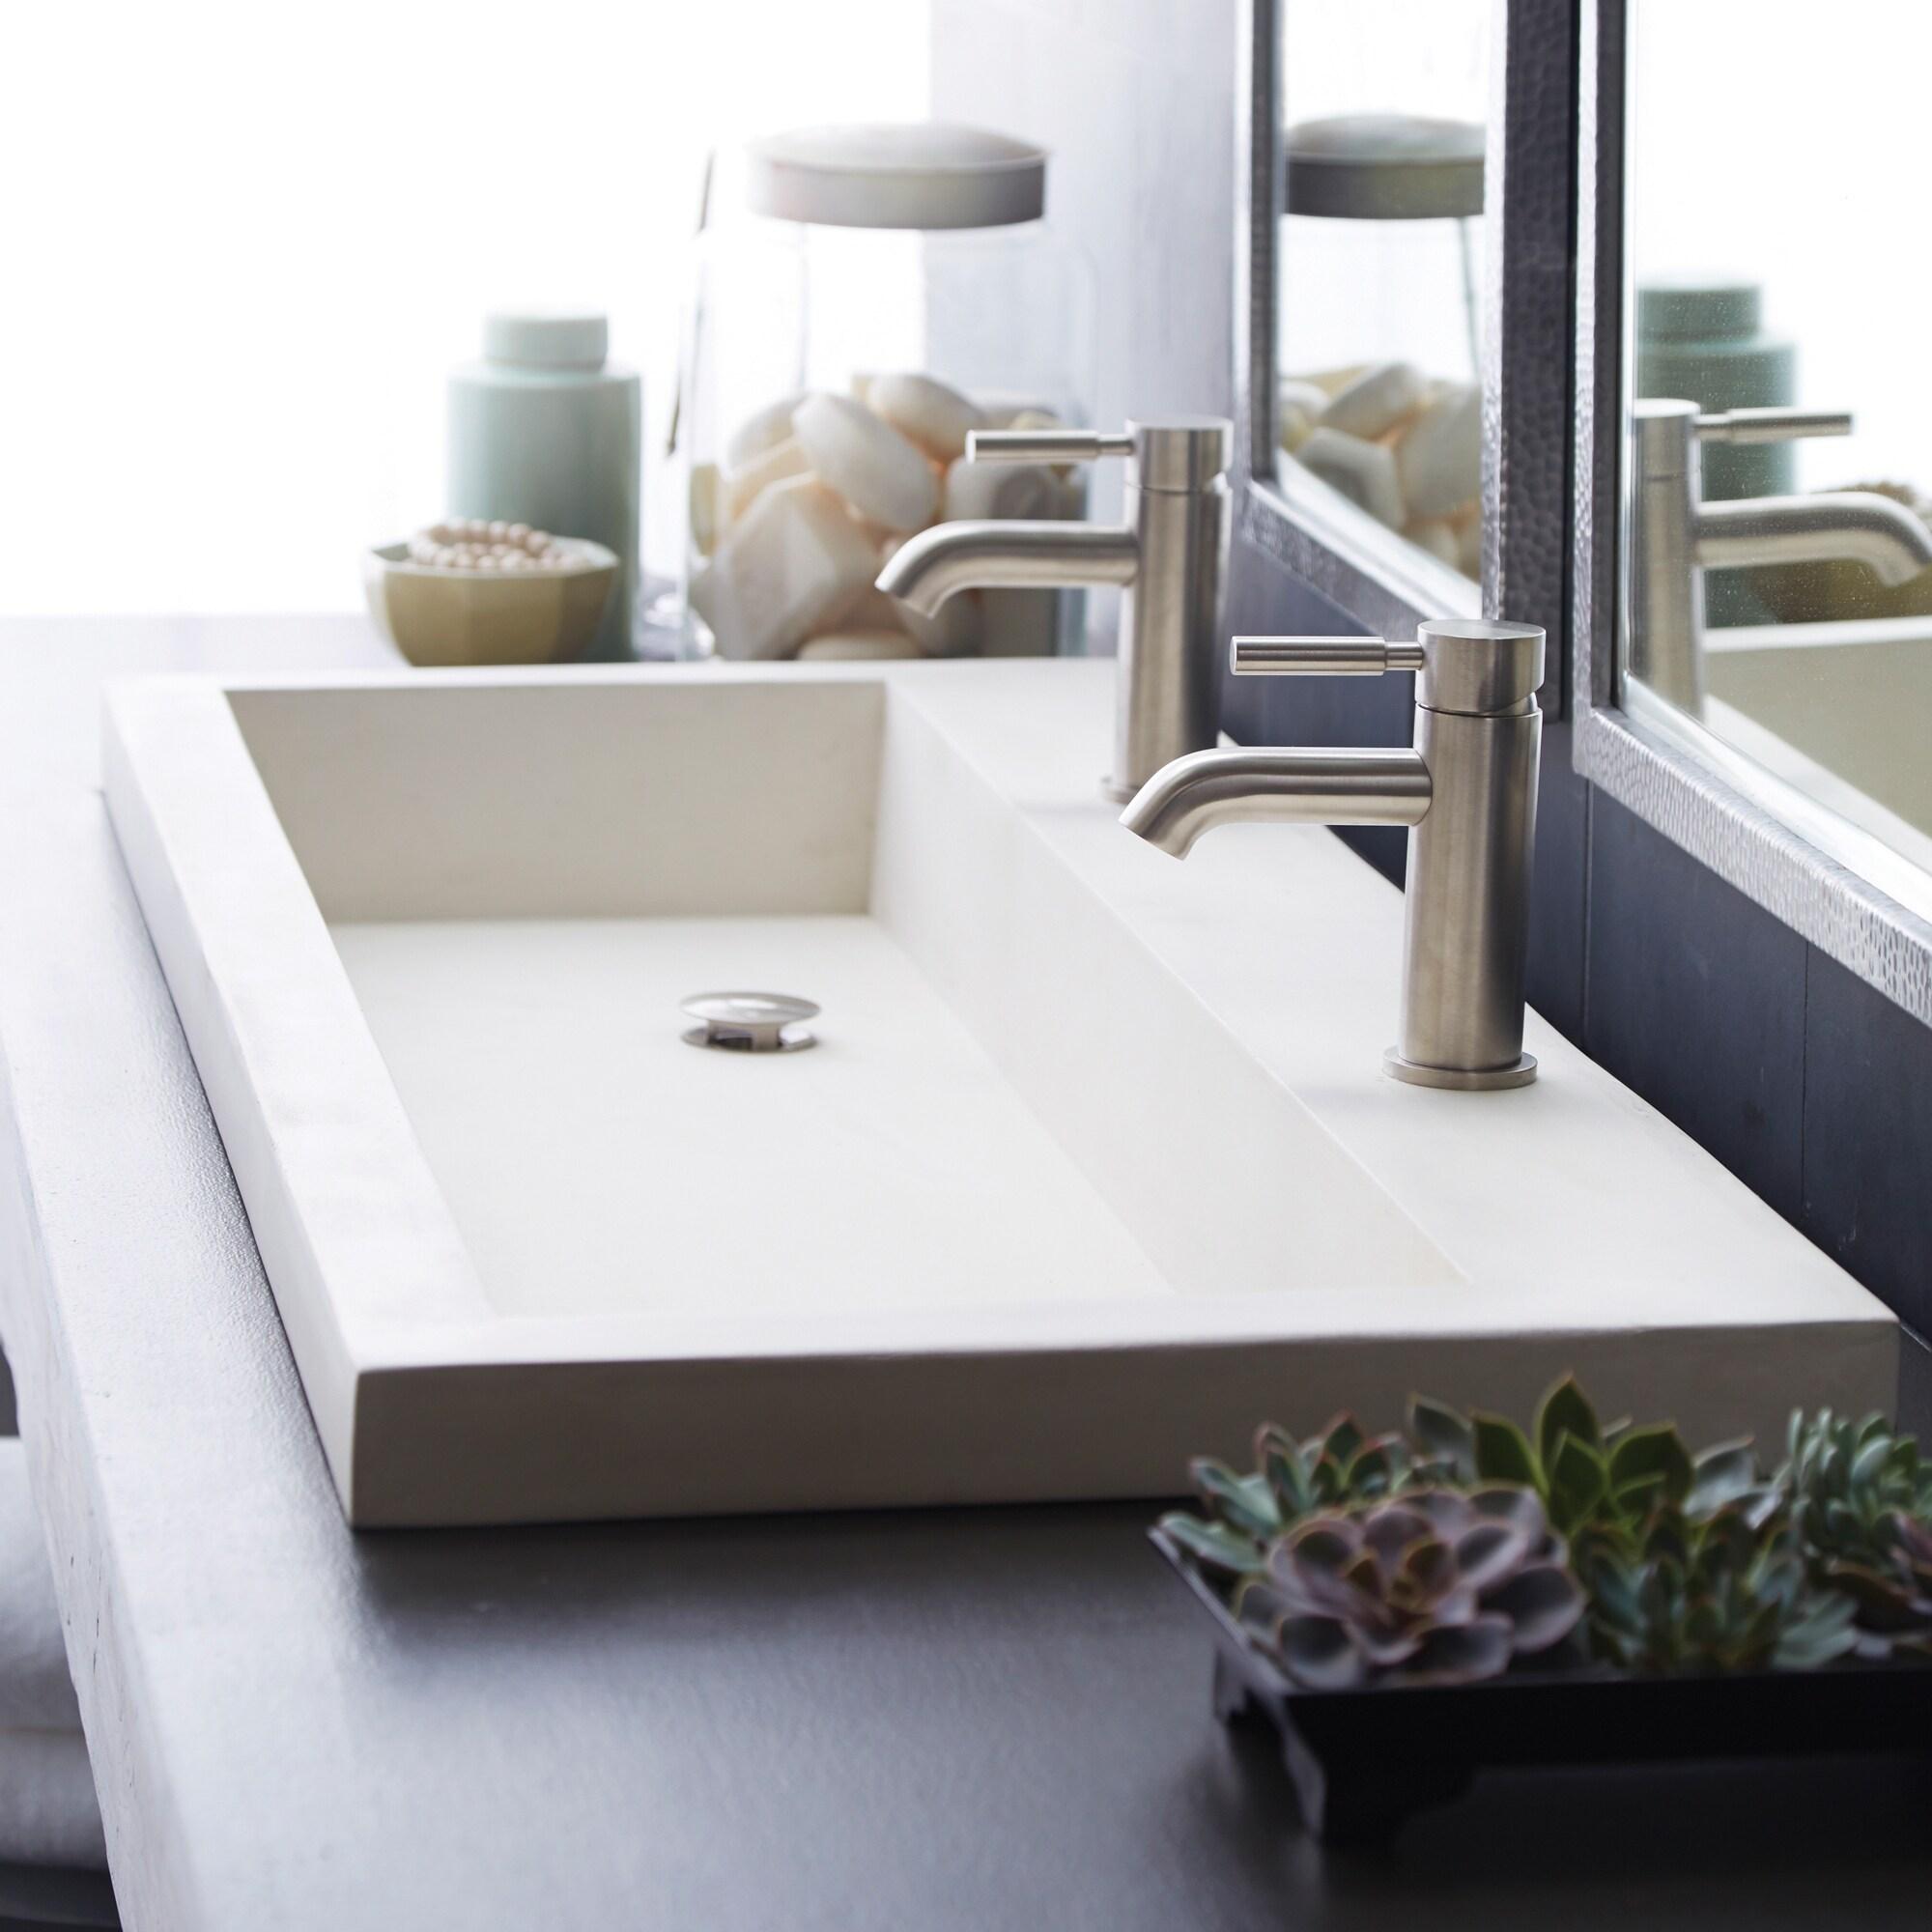 trough 48 inch nativestone undermount drop in double bathroom sink 48 x 19 x 5